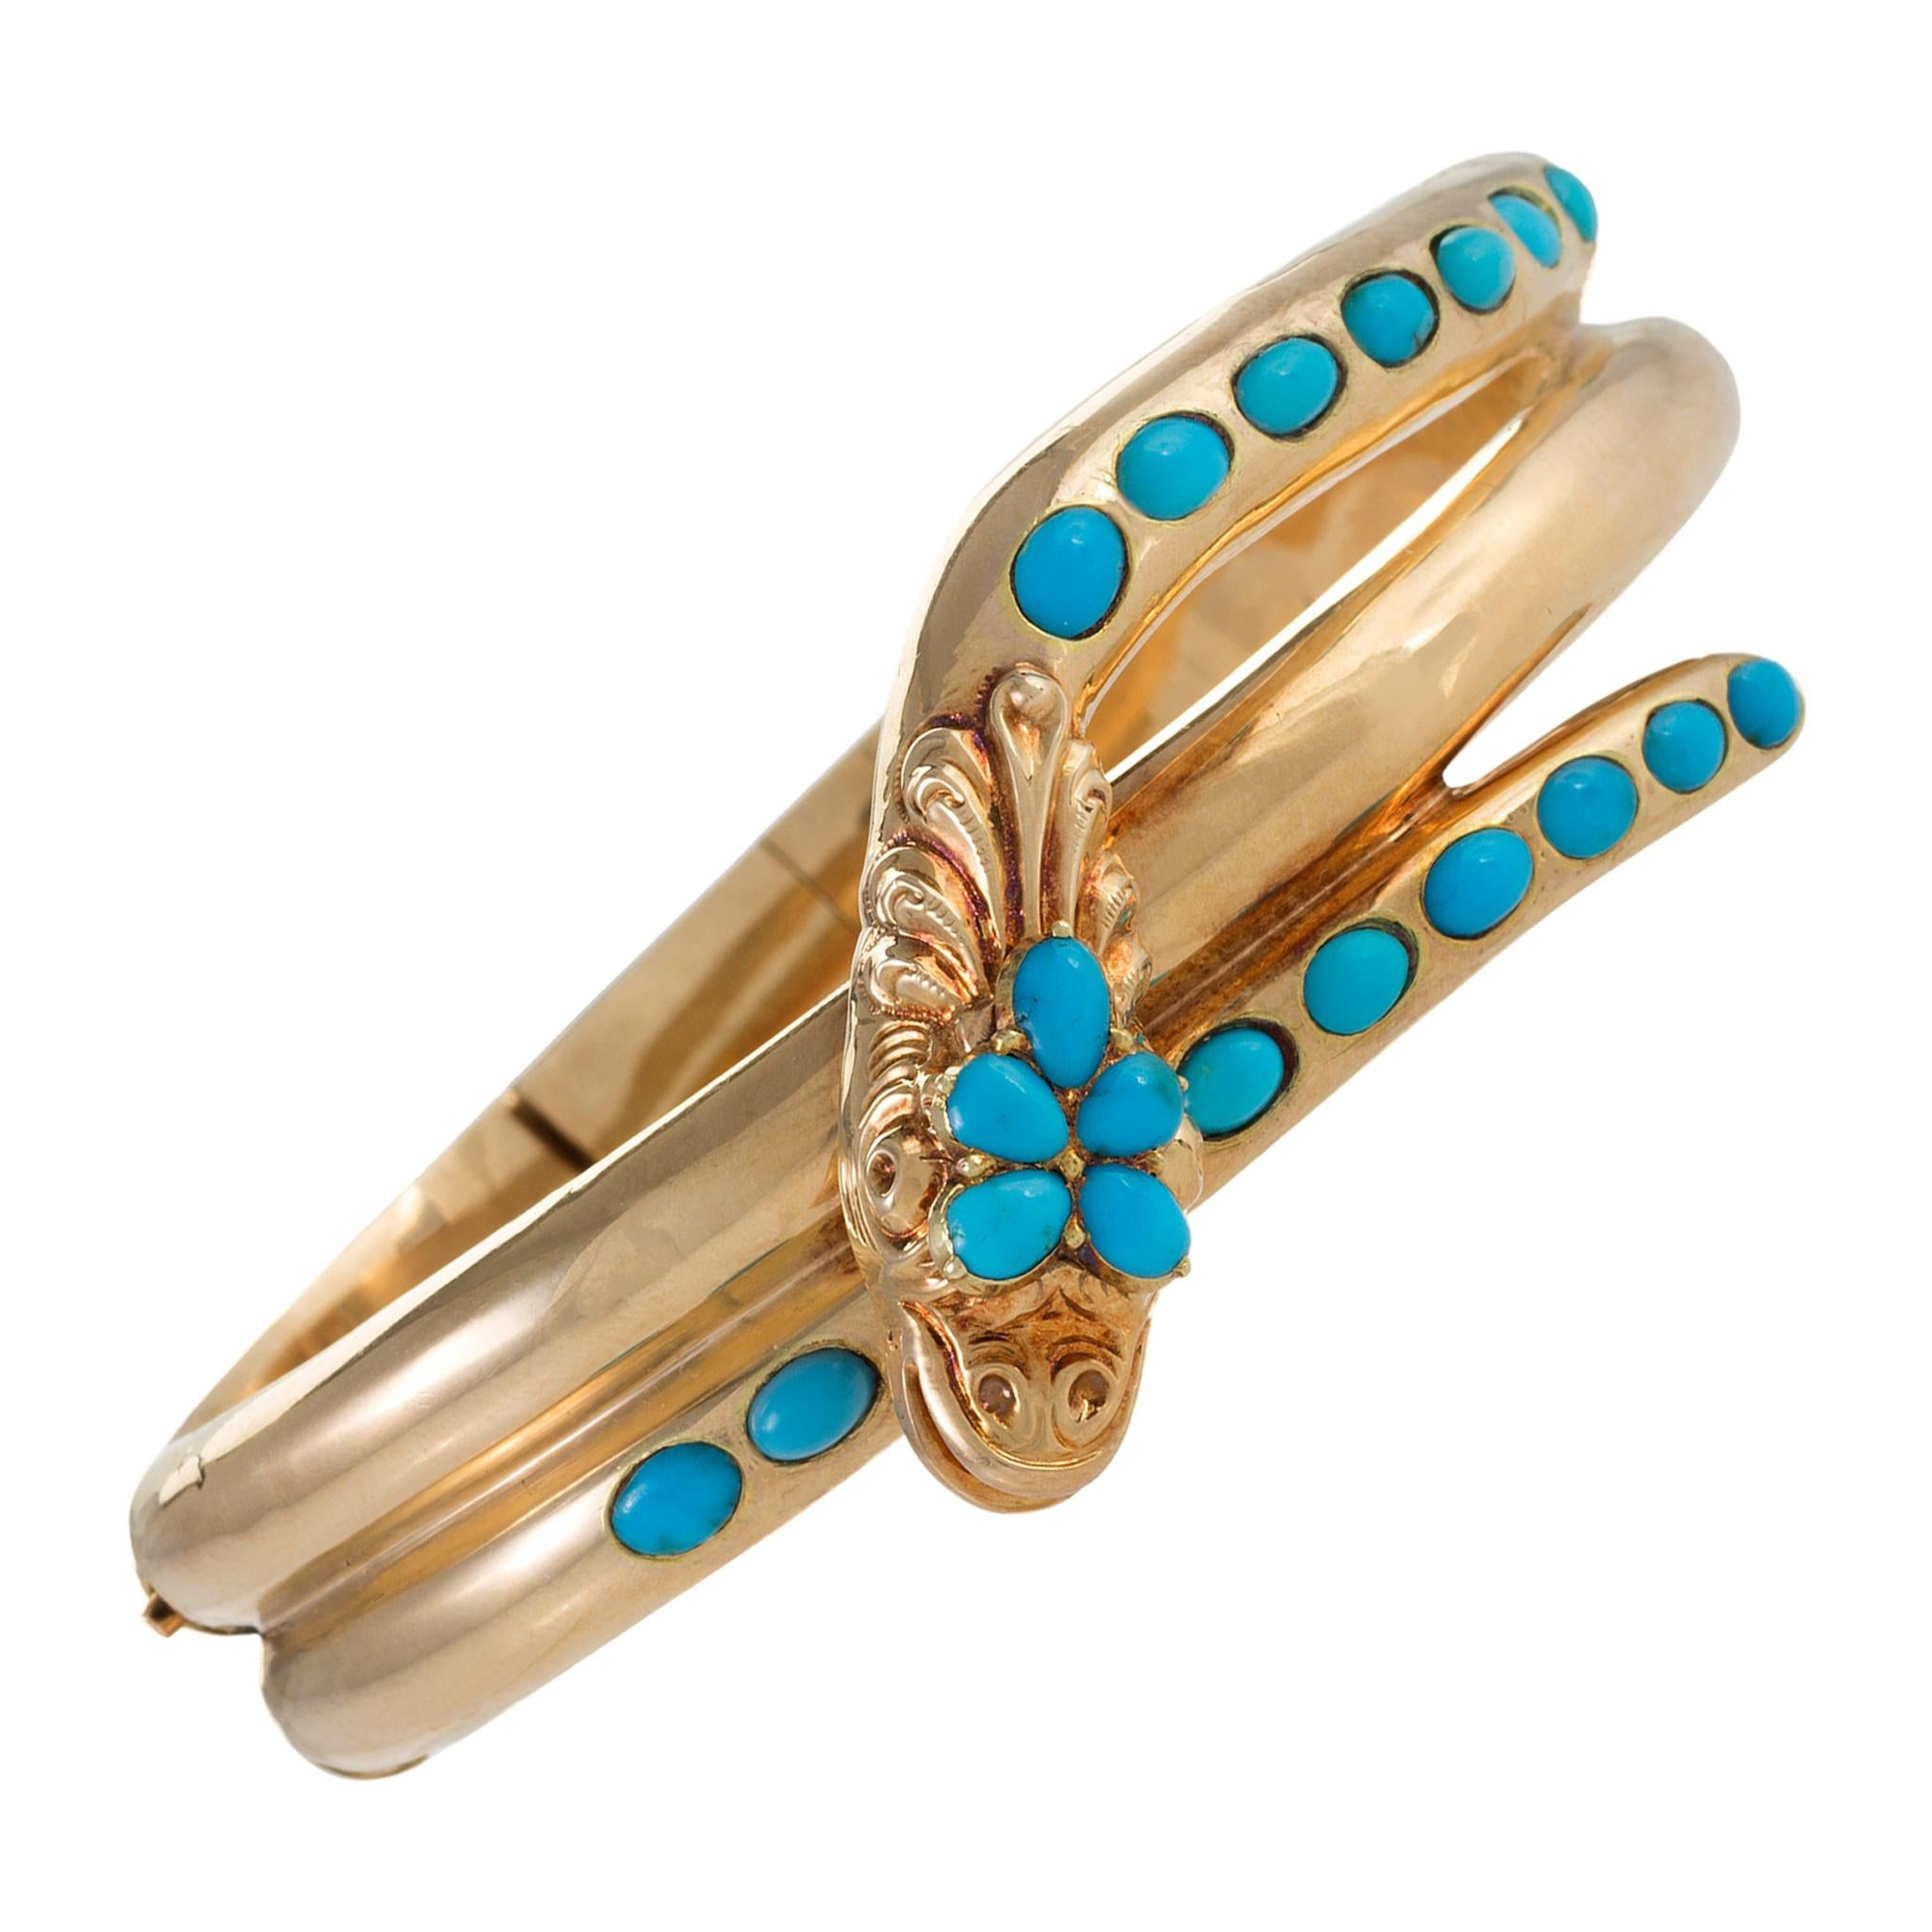 Turquoise Serpent Bangle Bracelet